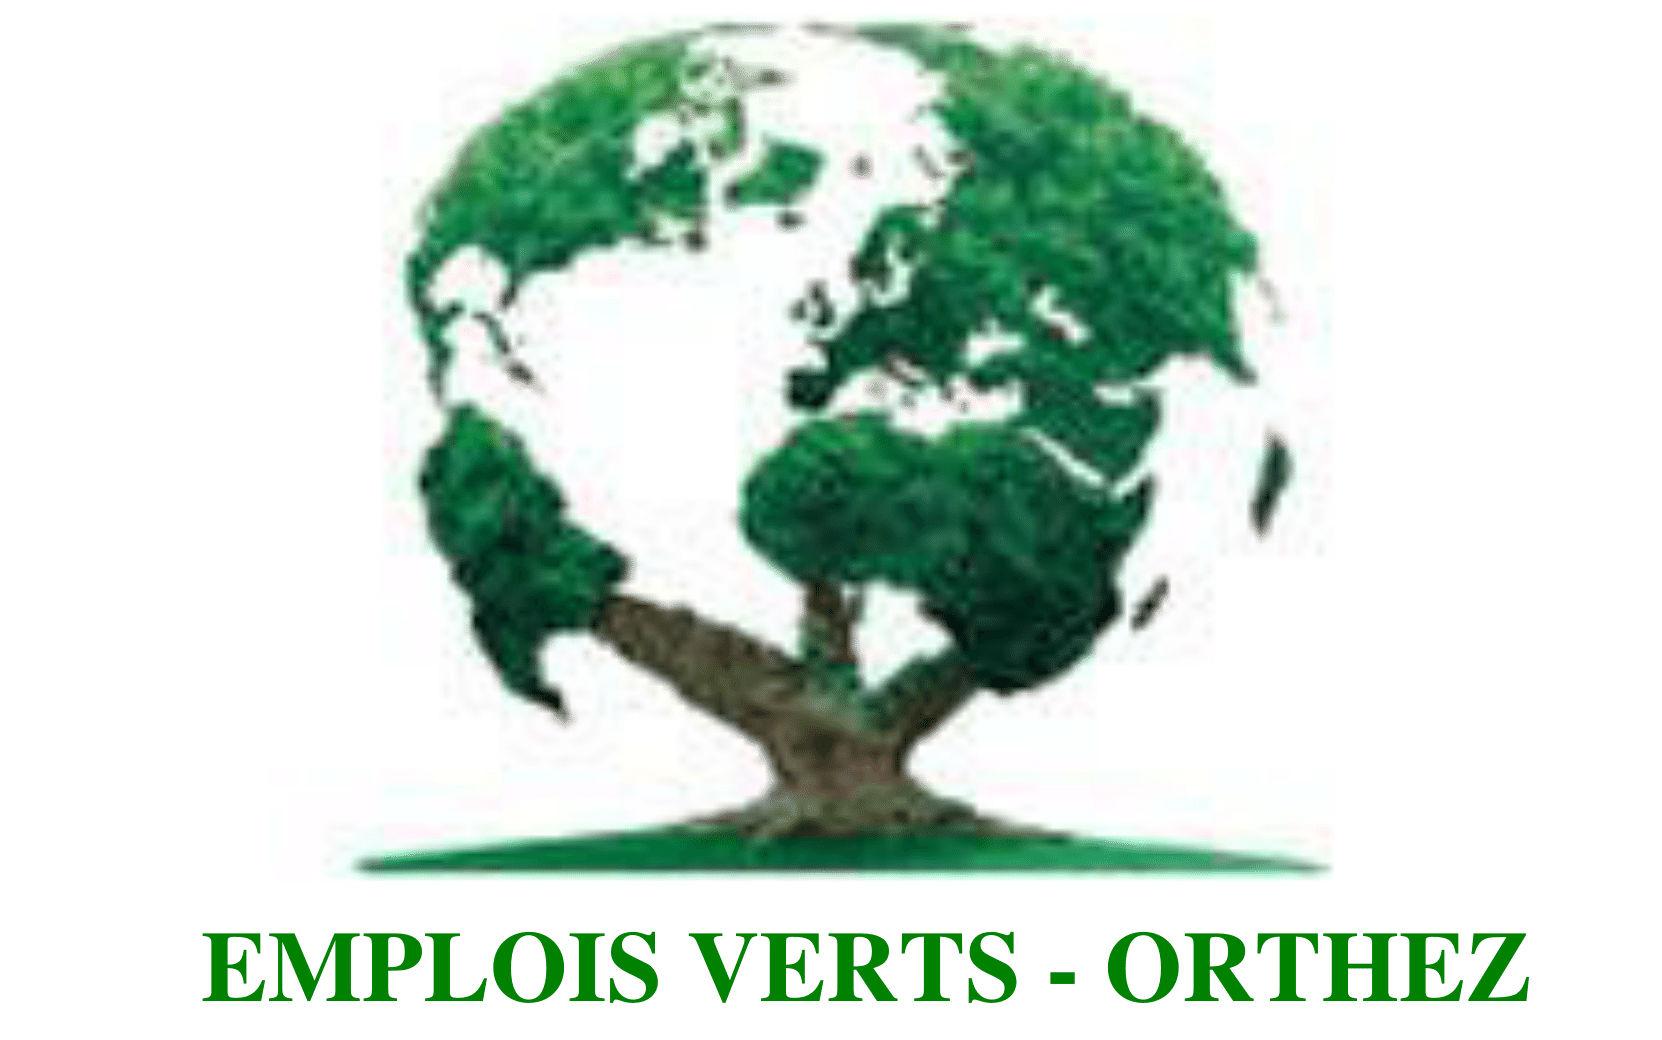 logo_609_logo_emplois_verts_2018.jpg